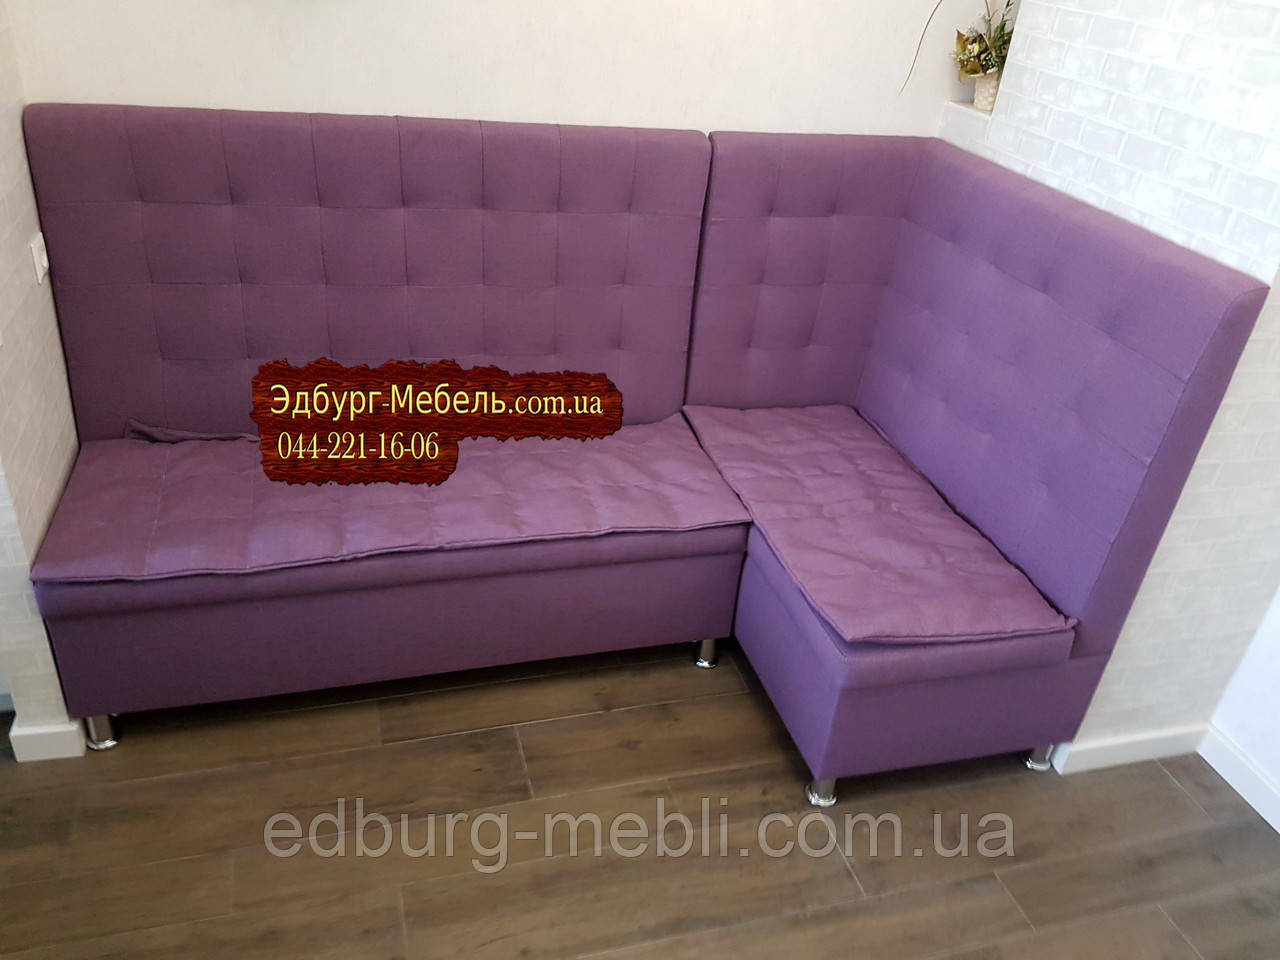 Высокий фиолетовый кухонный уголок 1900х1300мм